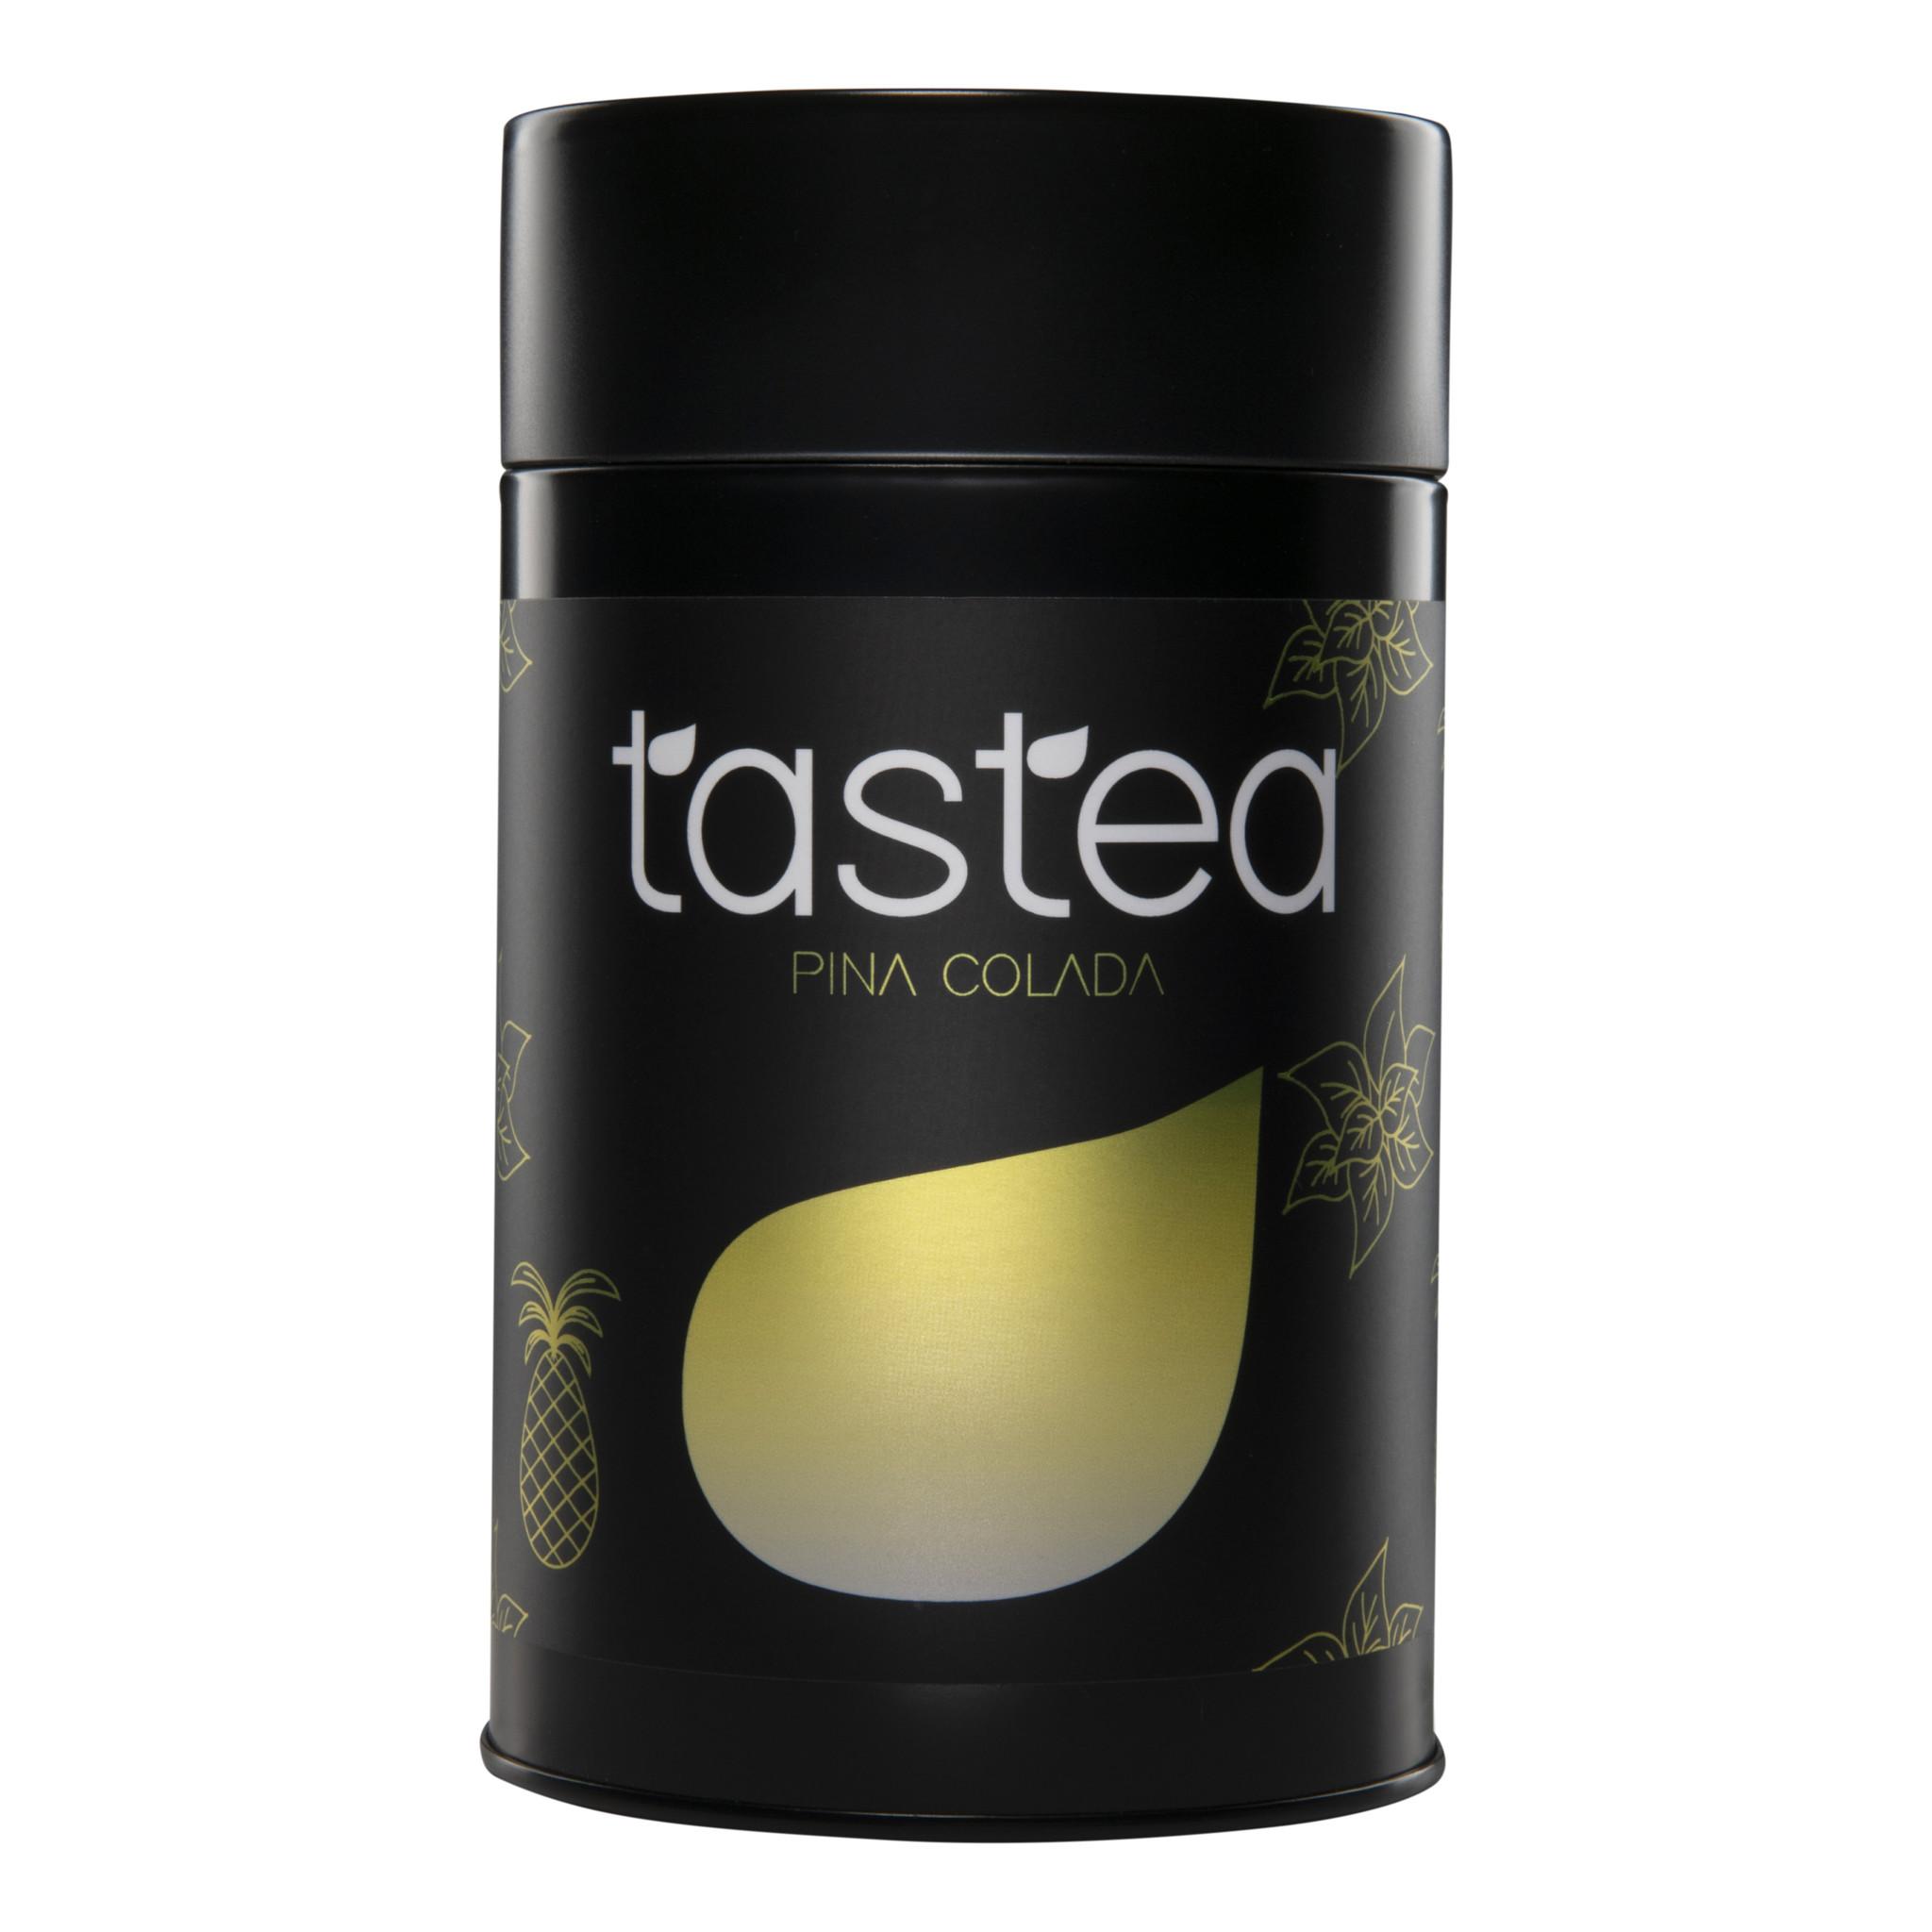 Tastea Pina Colada thee 100 gram